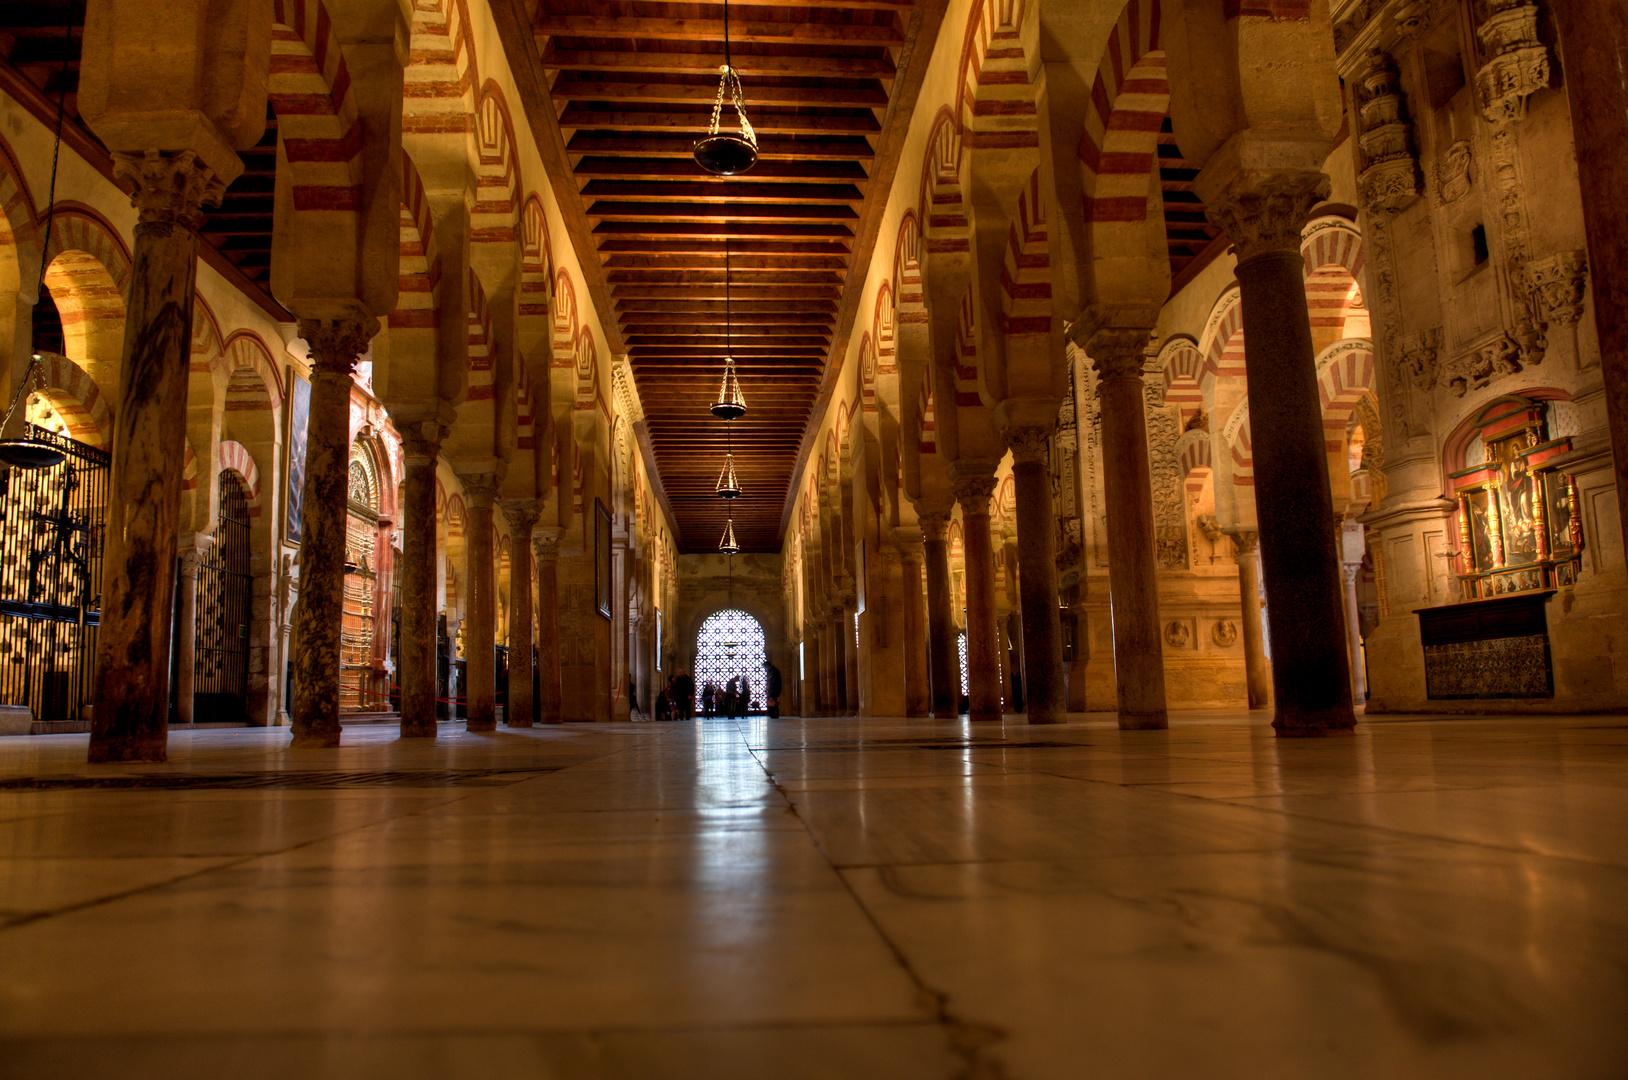 Mezquita in Cordoba I